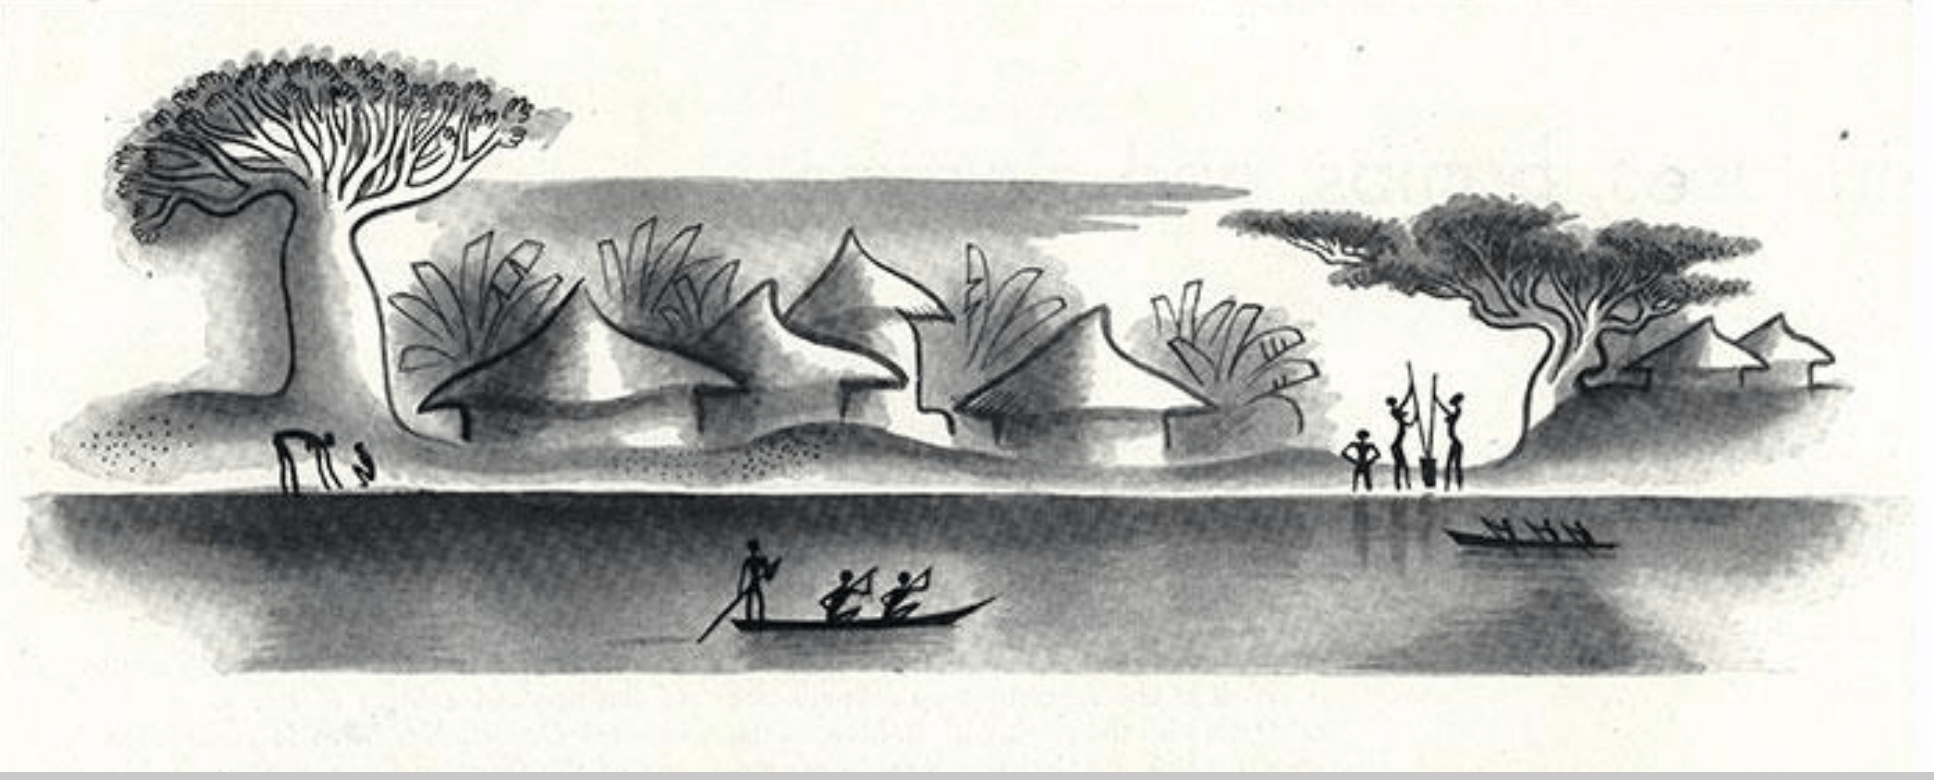 Esquisses De Miguel COVARRUBIAS8, René Maran